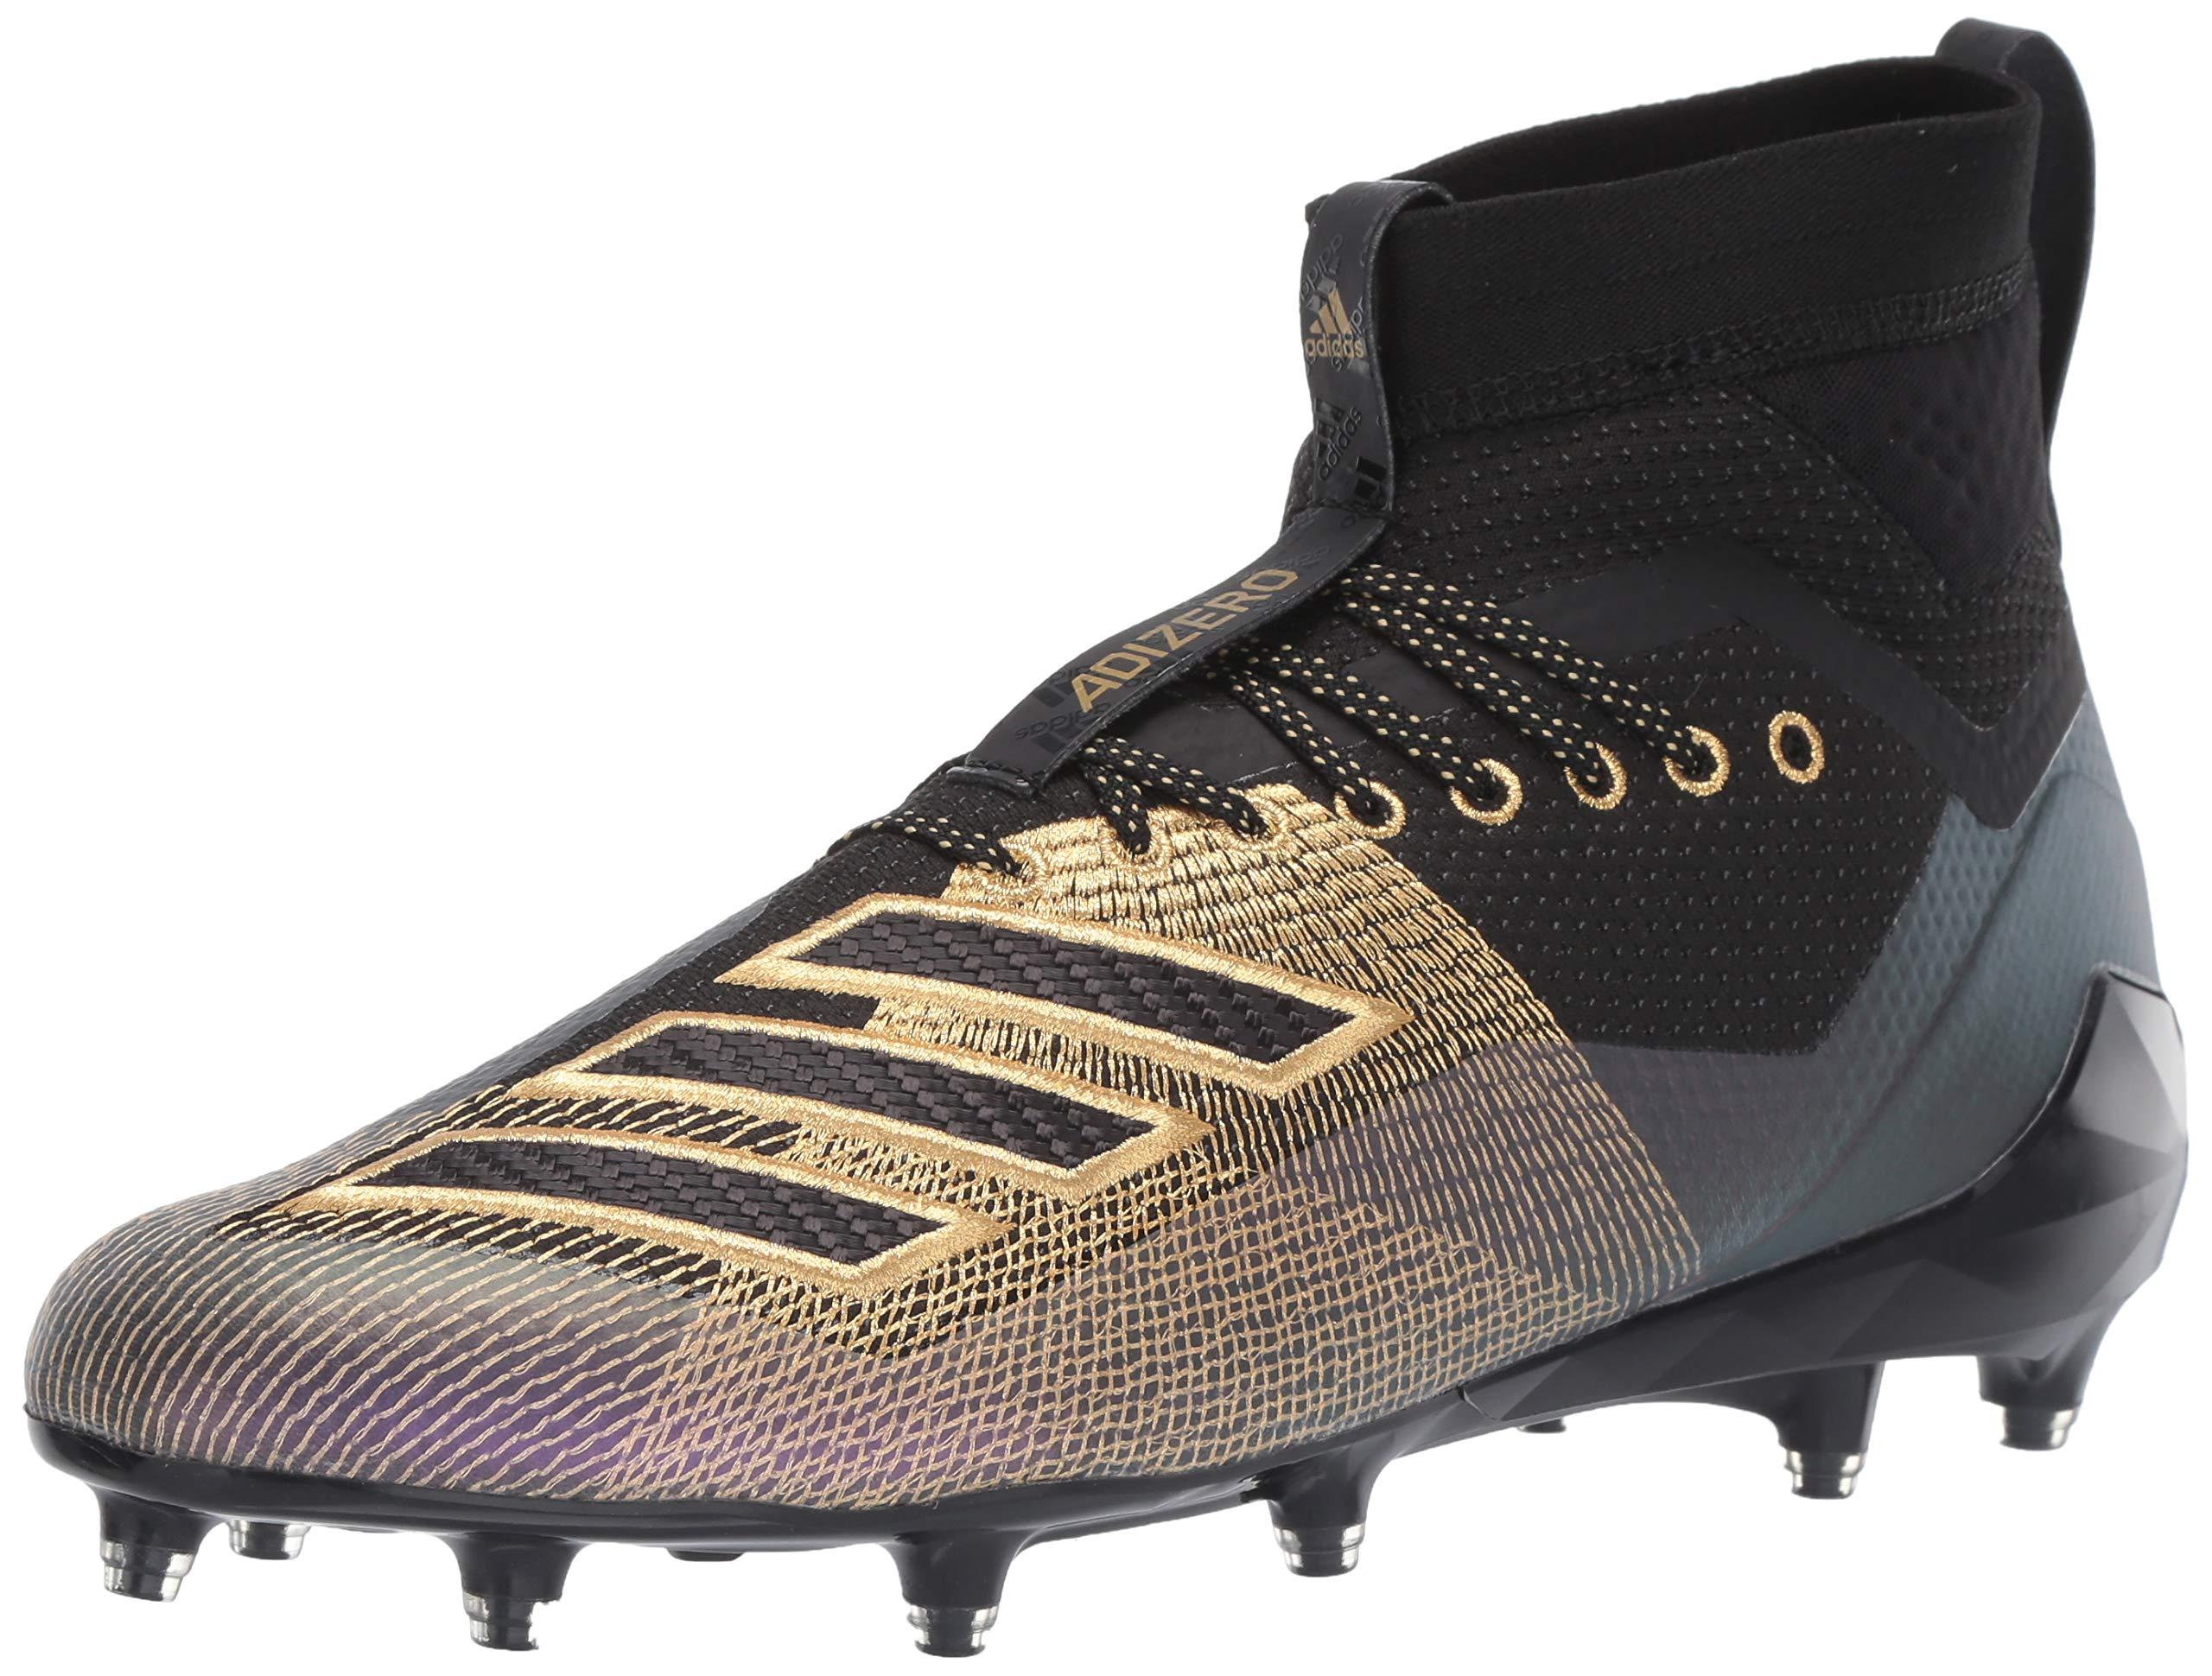 adidas Men's Adizero 8.0 SK Football Shoe Black/Gold Metallic/Grey 6.5 M US